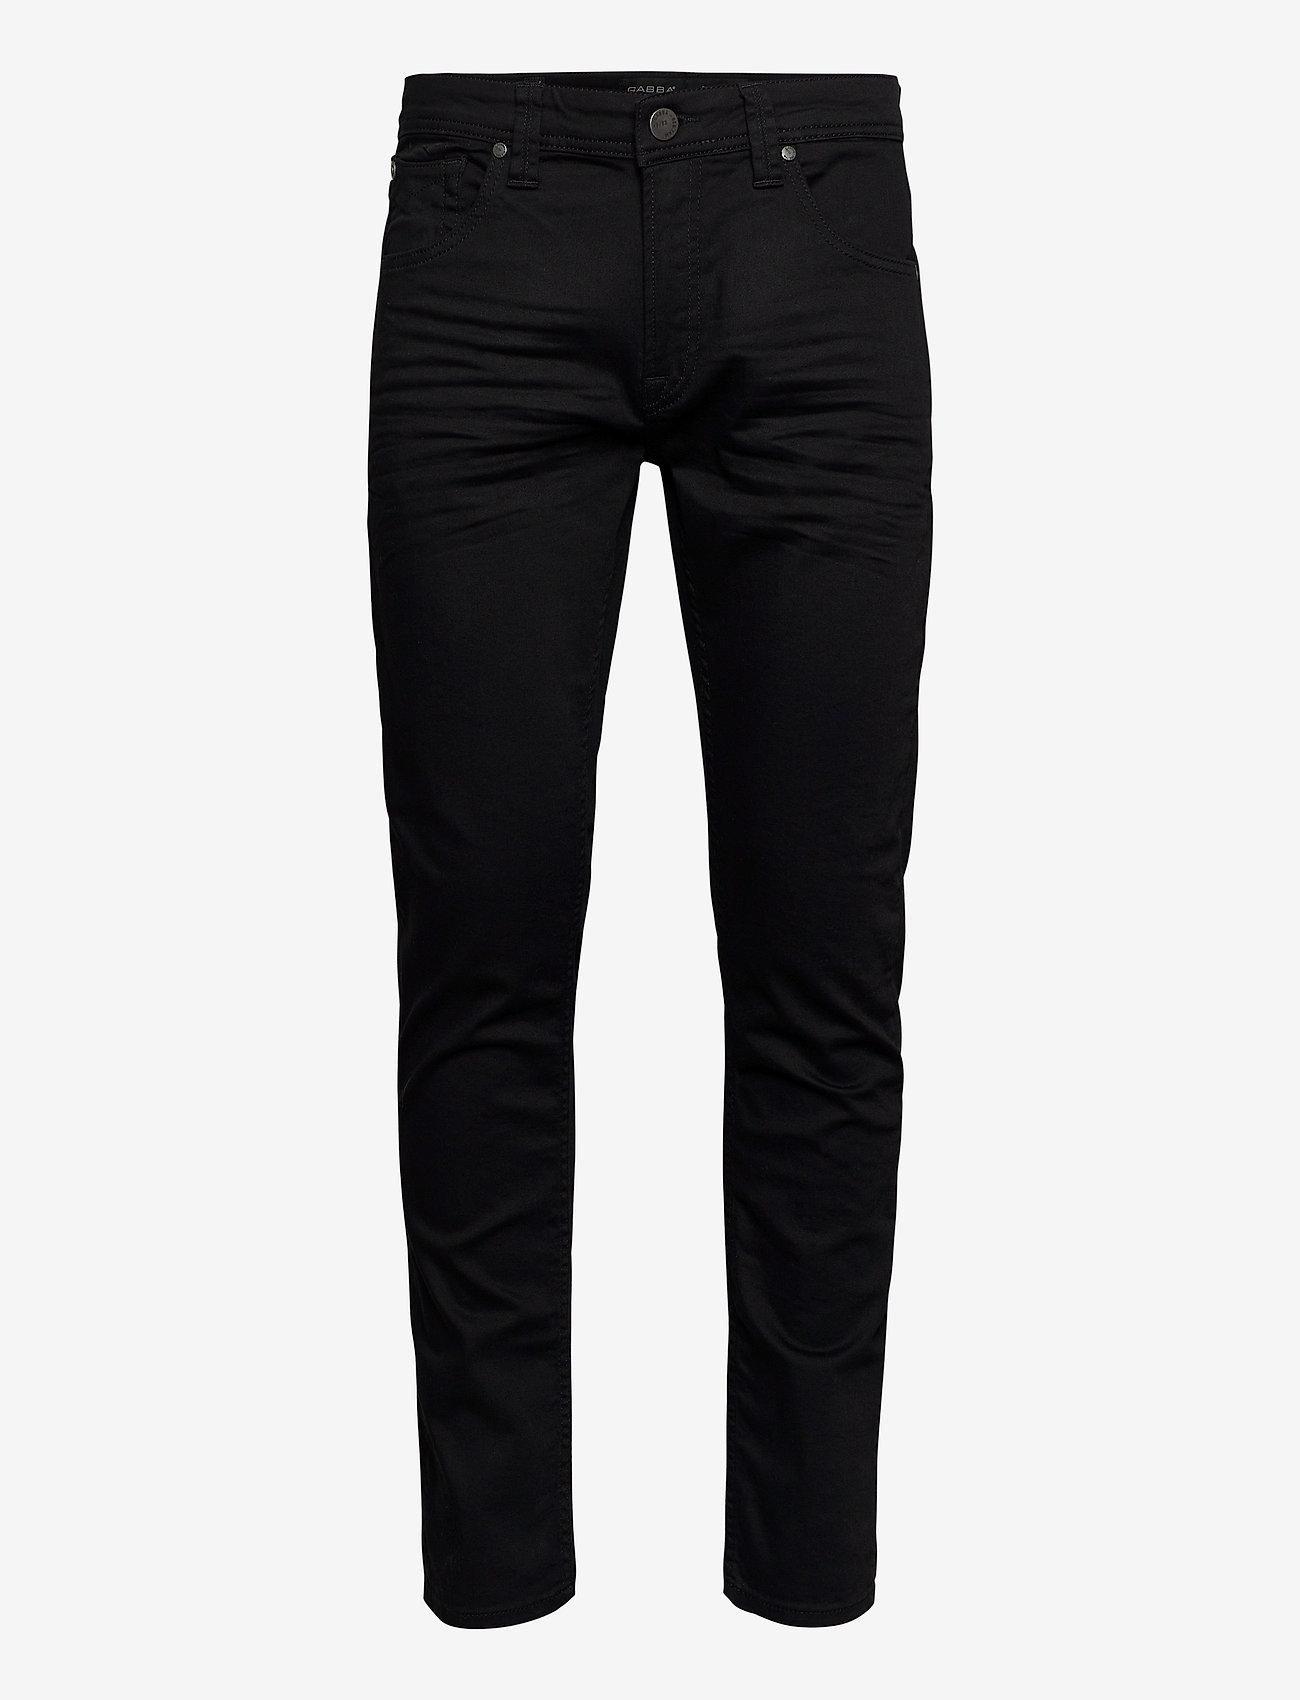 Gabba - Nico Black Night Jeans - regular jeans - rs0775 - 0